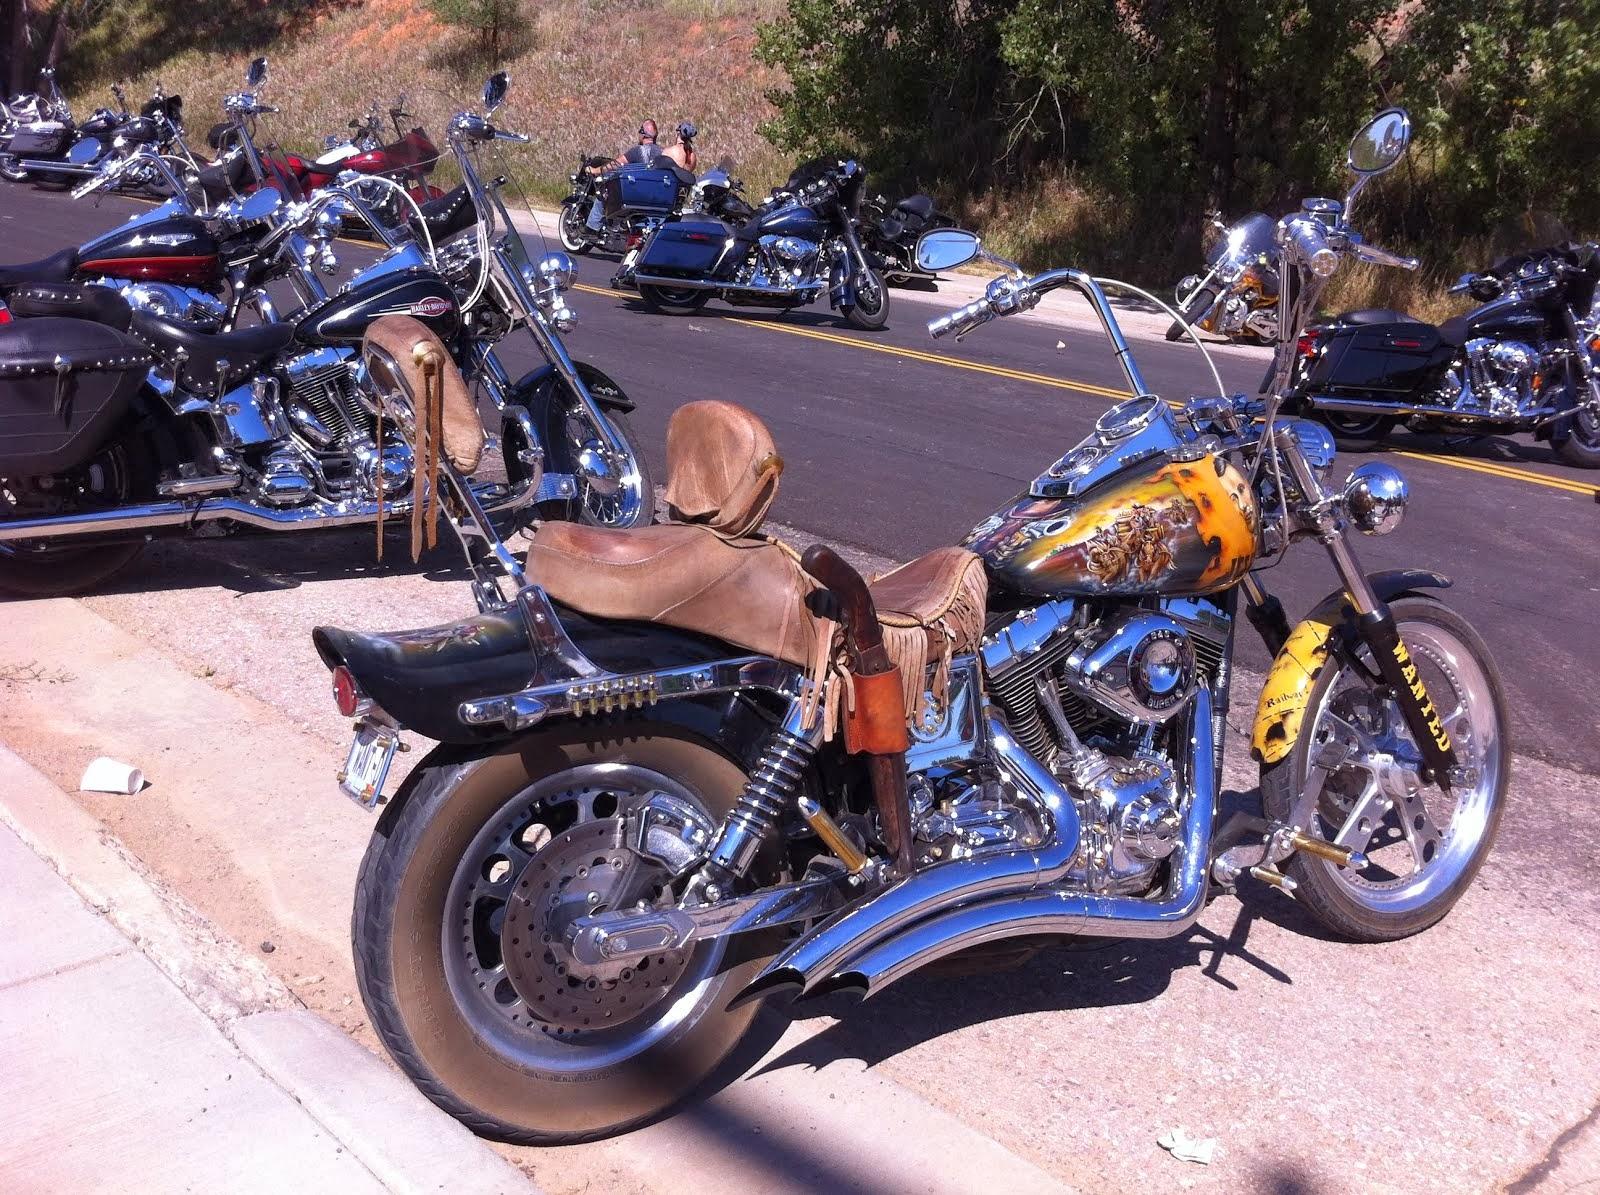 Hulett motorcycle rally